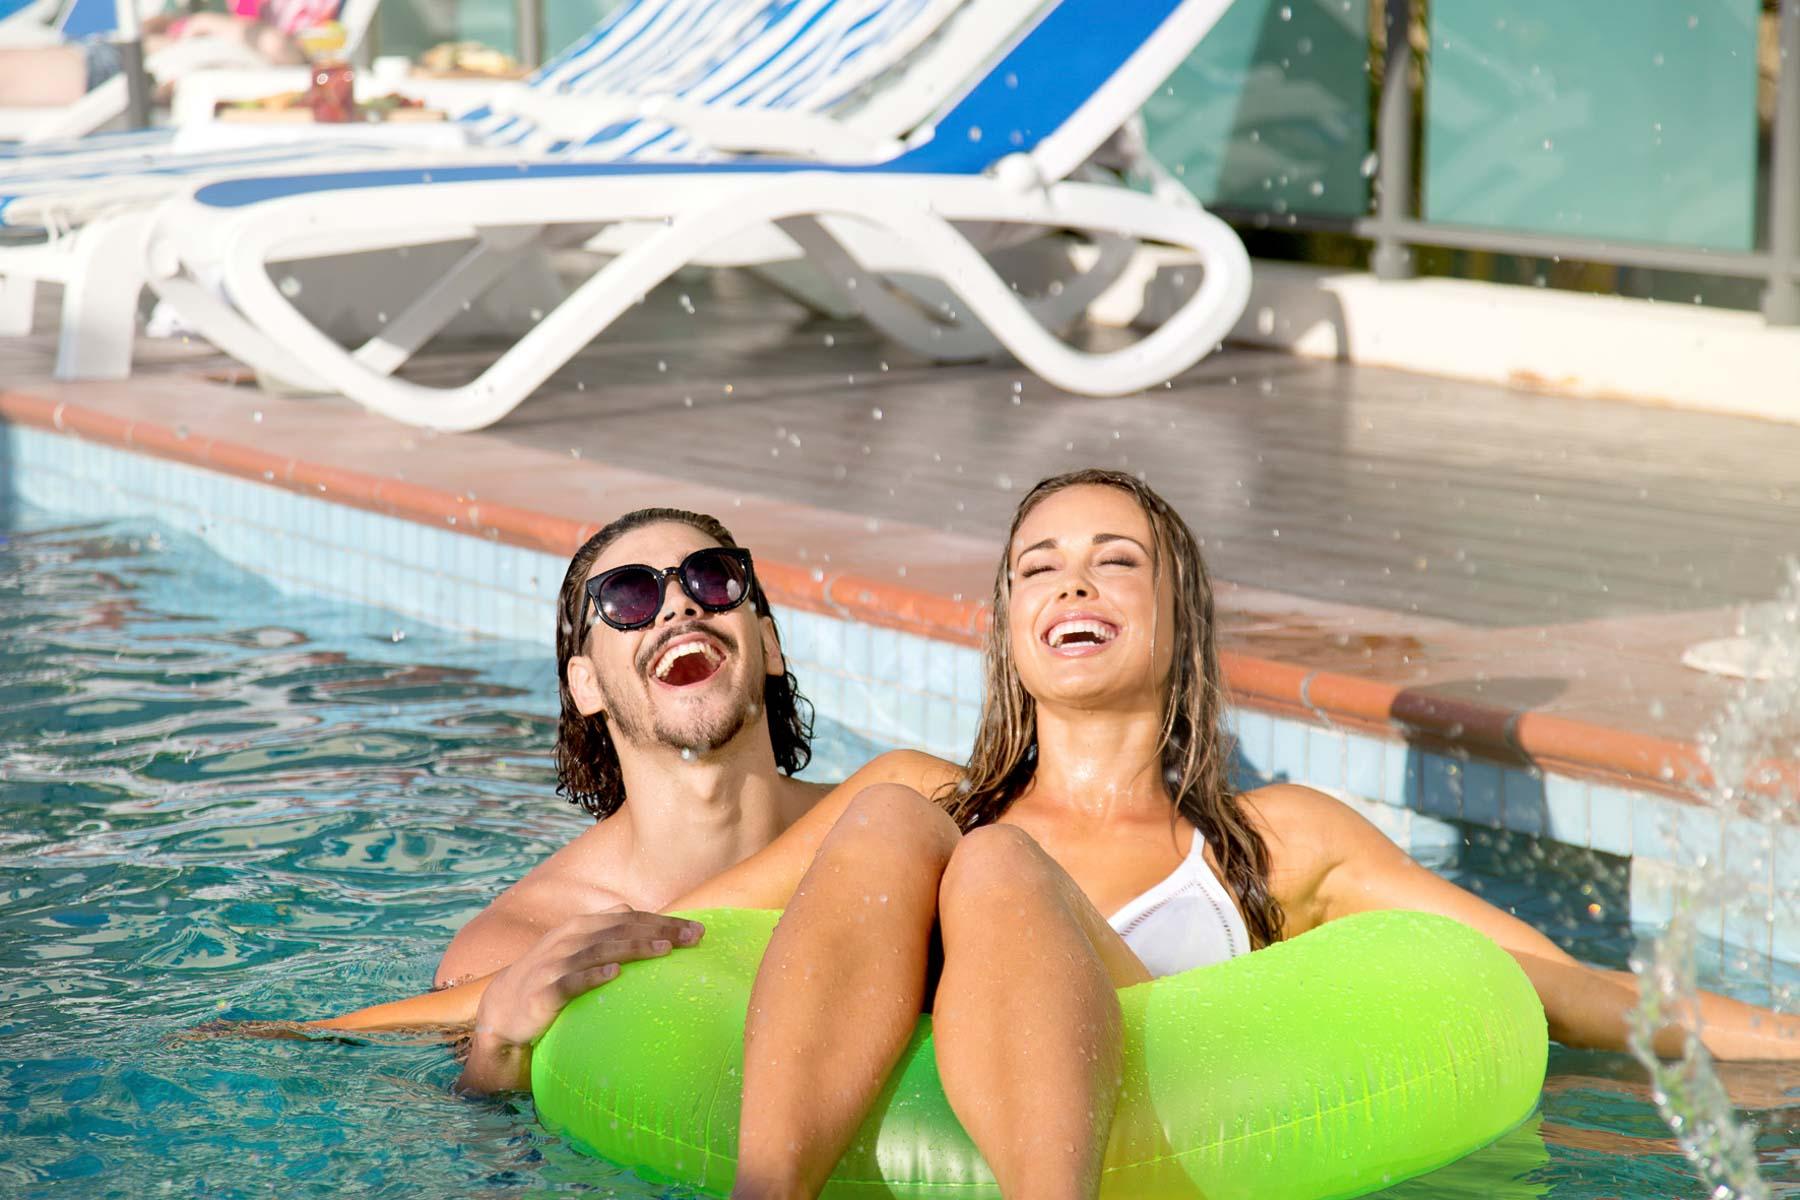 013116watermark-hotels-photography-claudio-kirac-artwork-agency_10.jpg